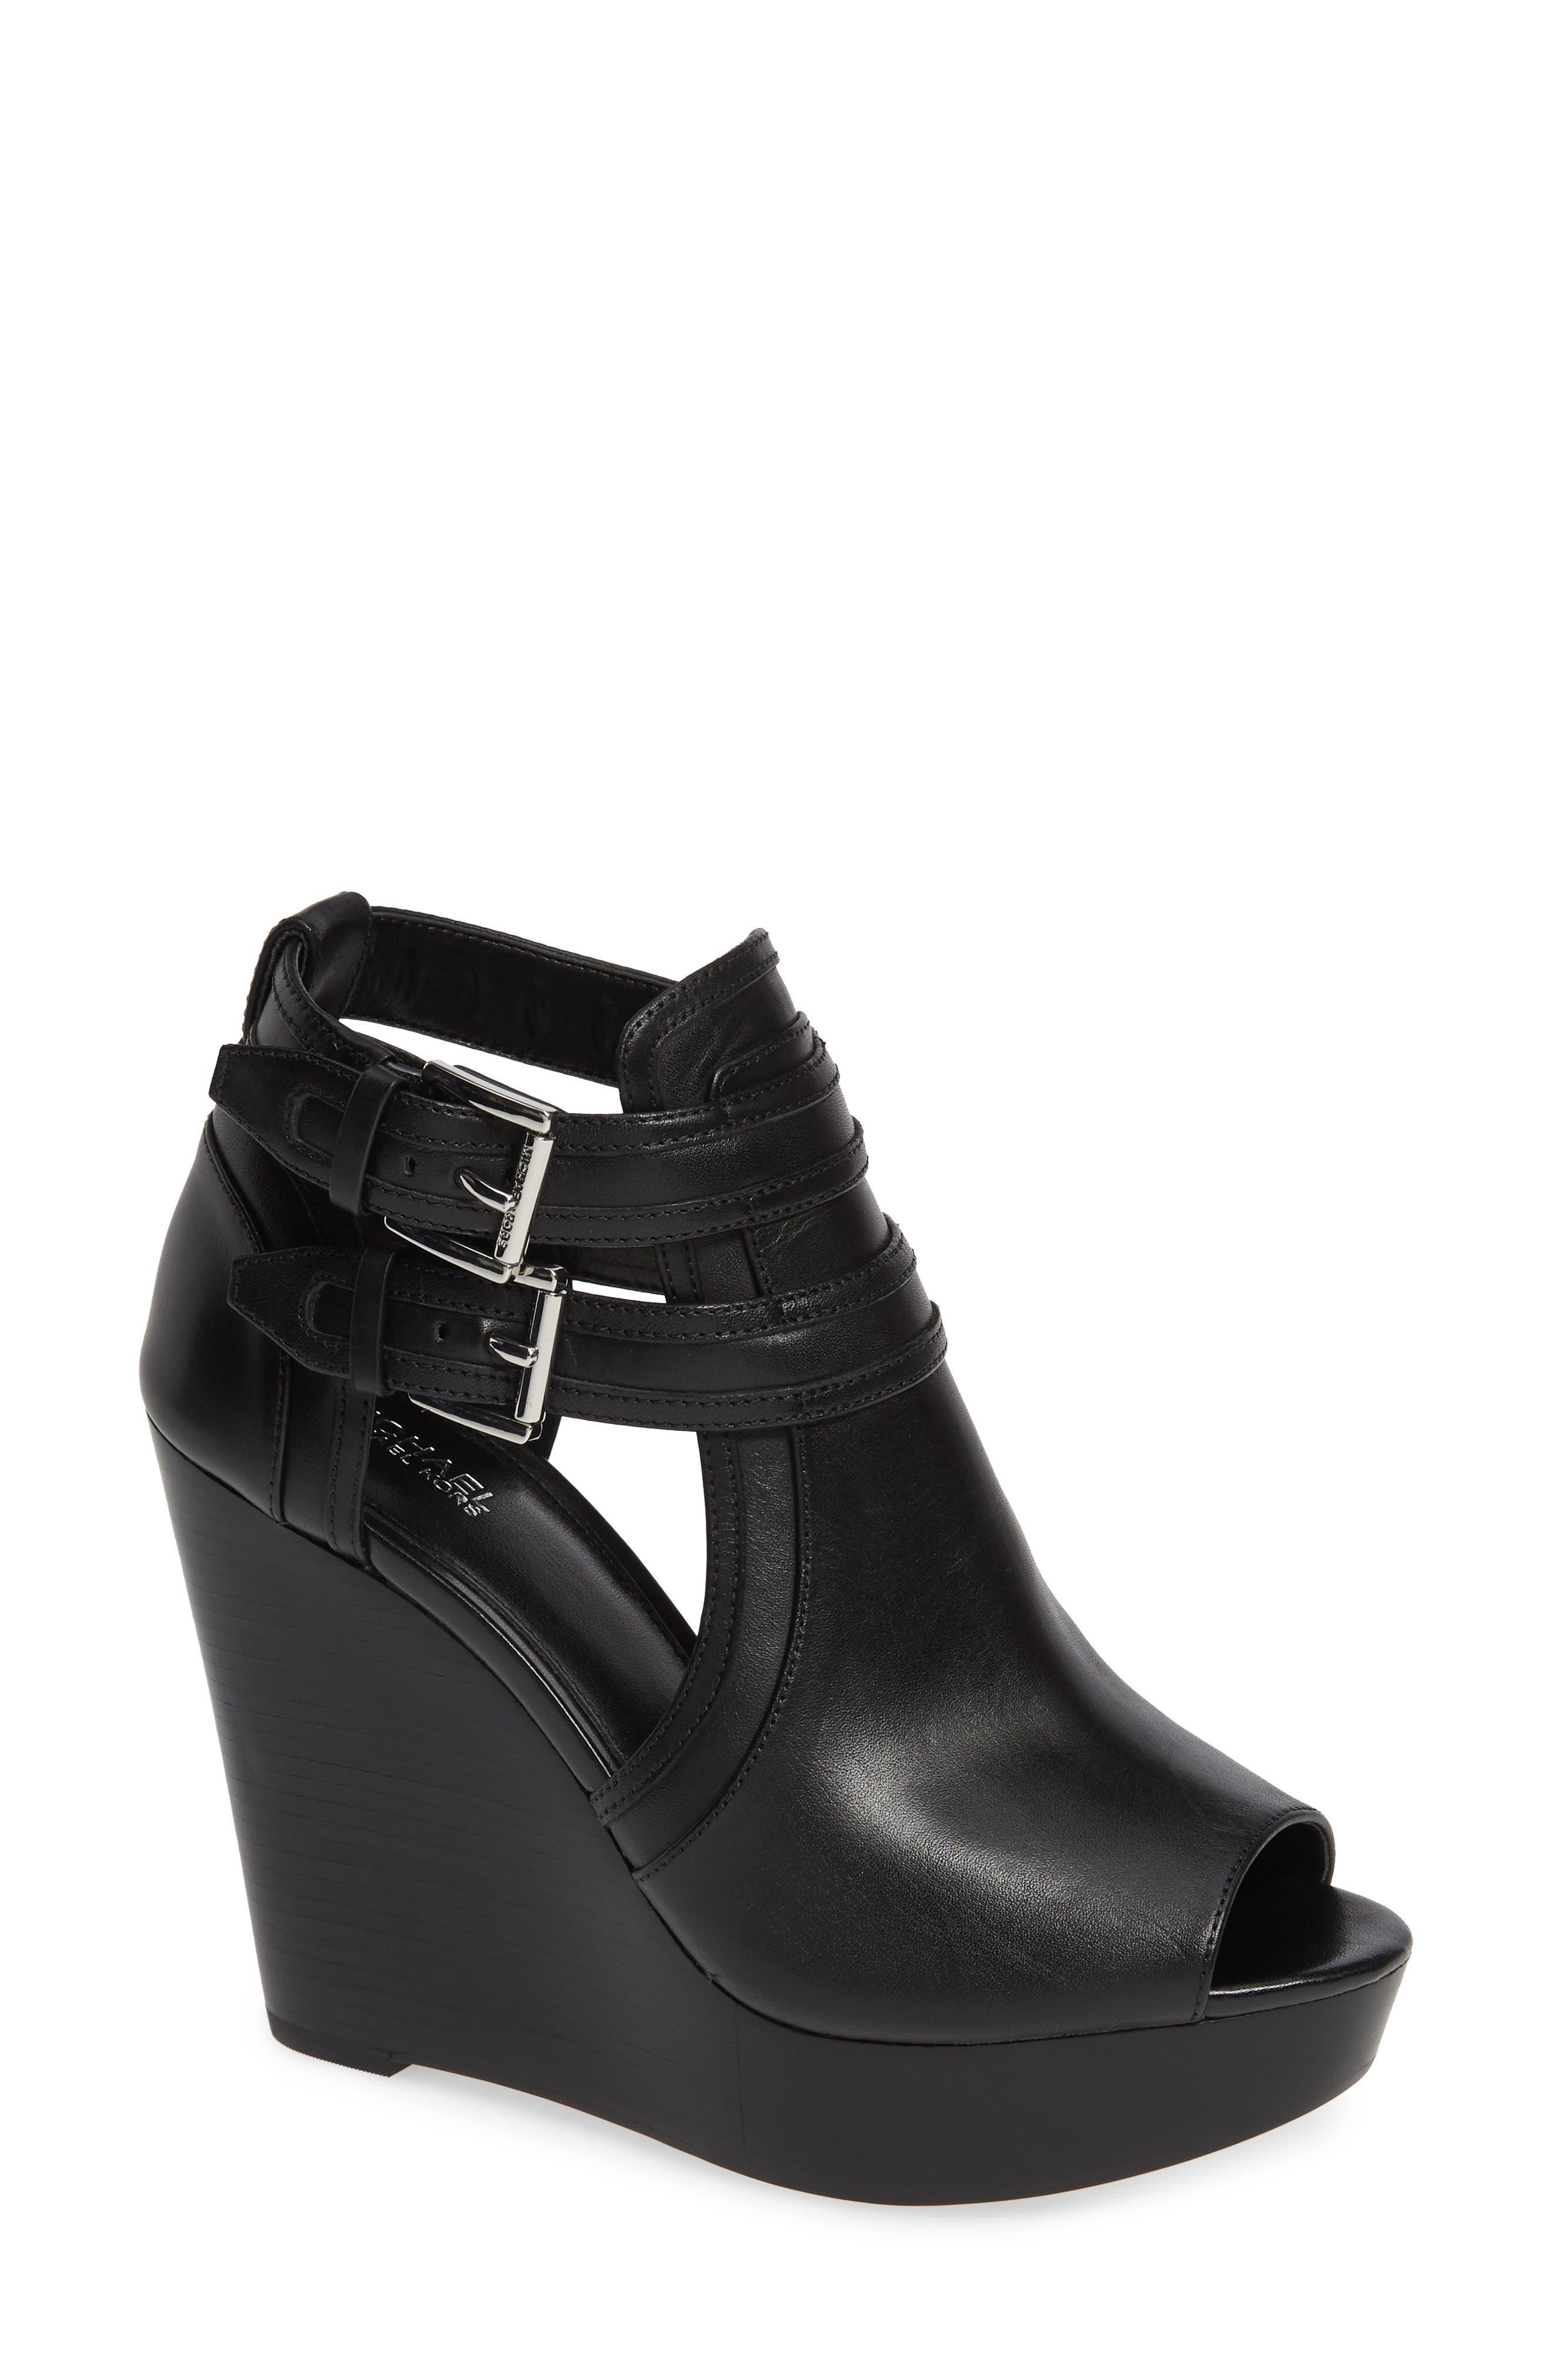 Michael Michael Kors Blaze Wedge Sandal- Black